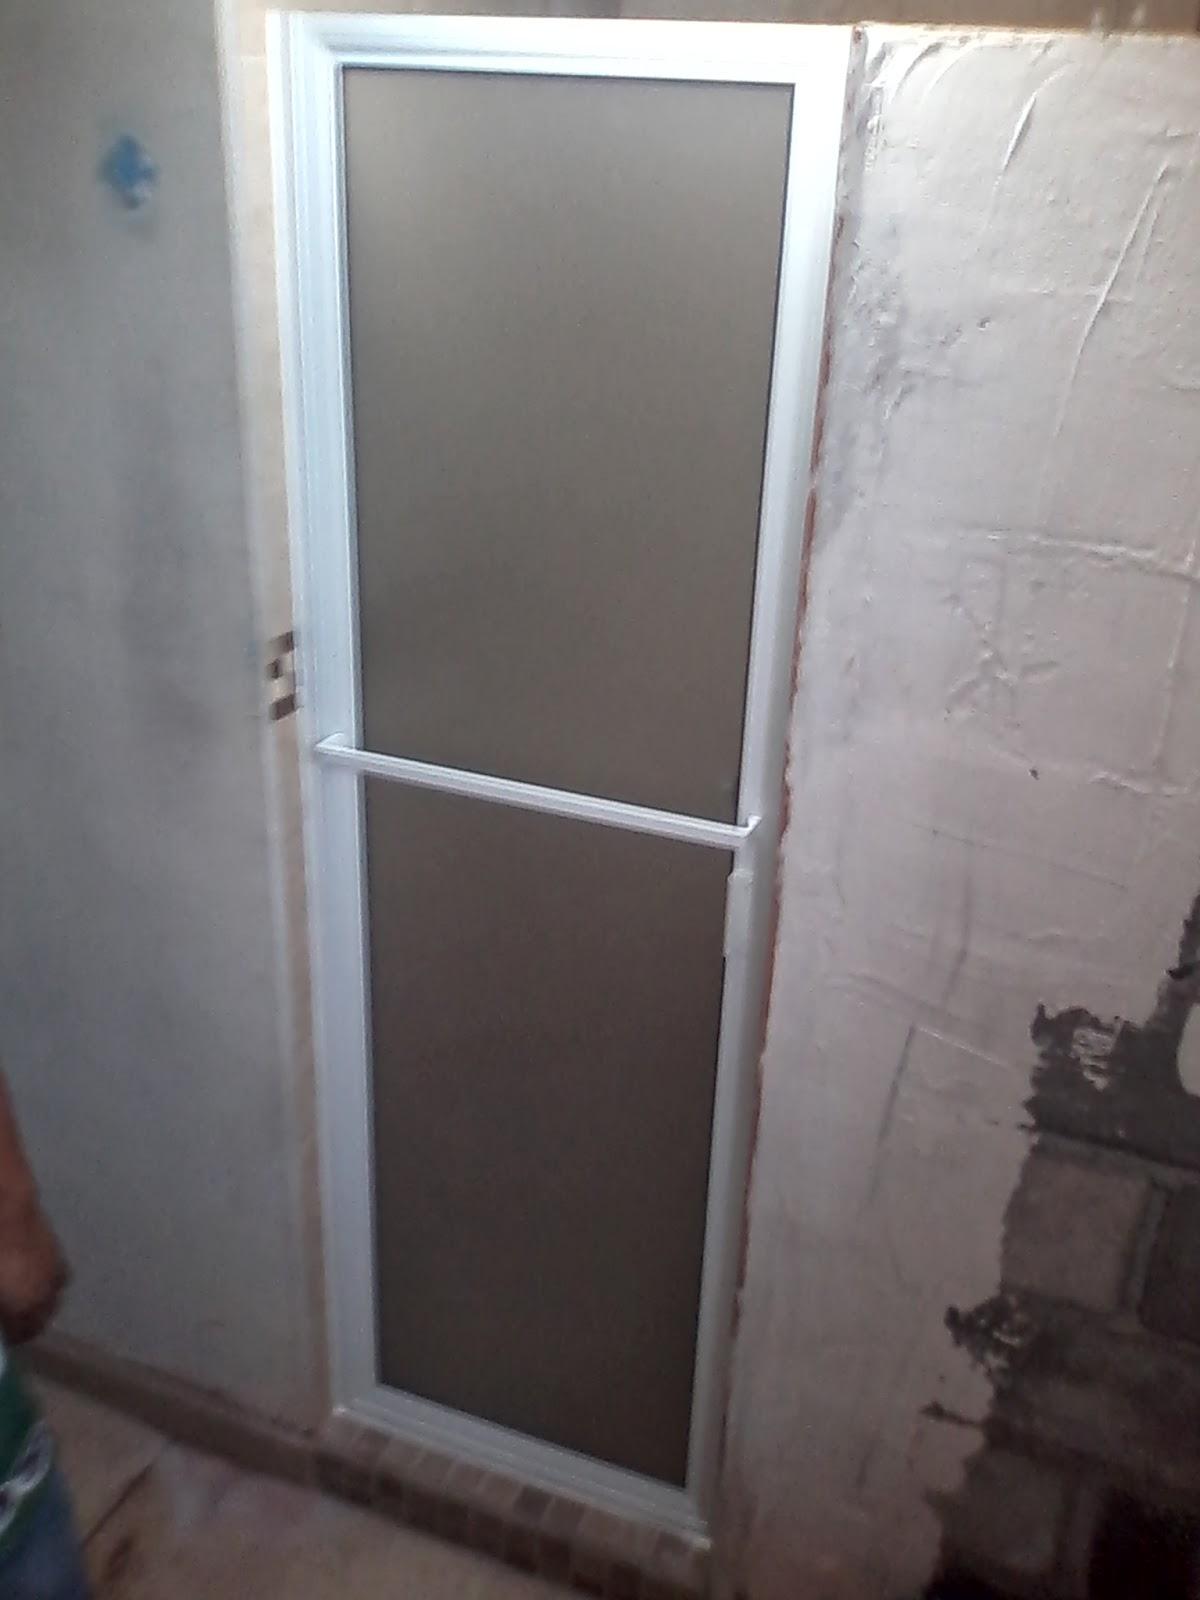 Laminas De Aluminio Para Puertas De Baño:Puertas, ventanas de aluminio: PUERTA BATIENTE DE ALUMINIO CON